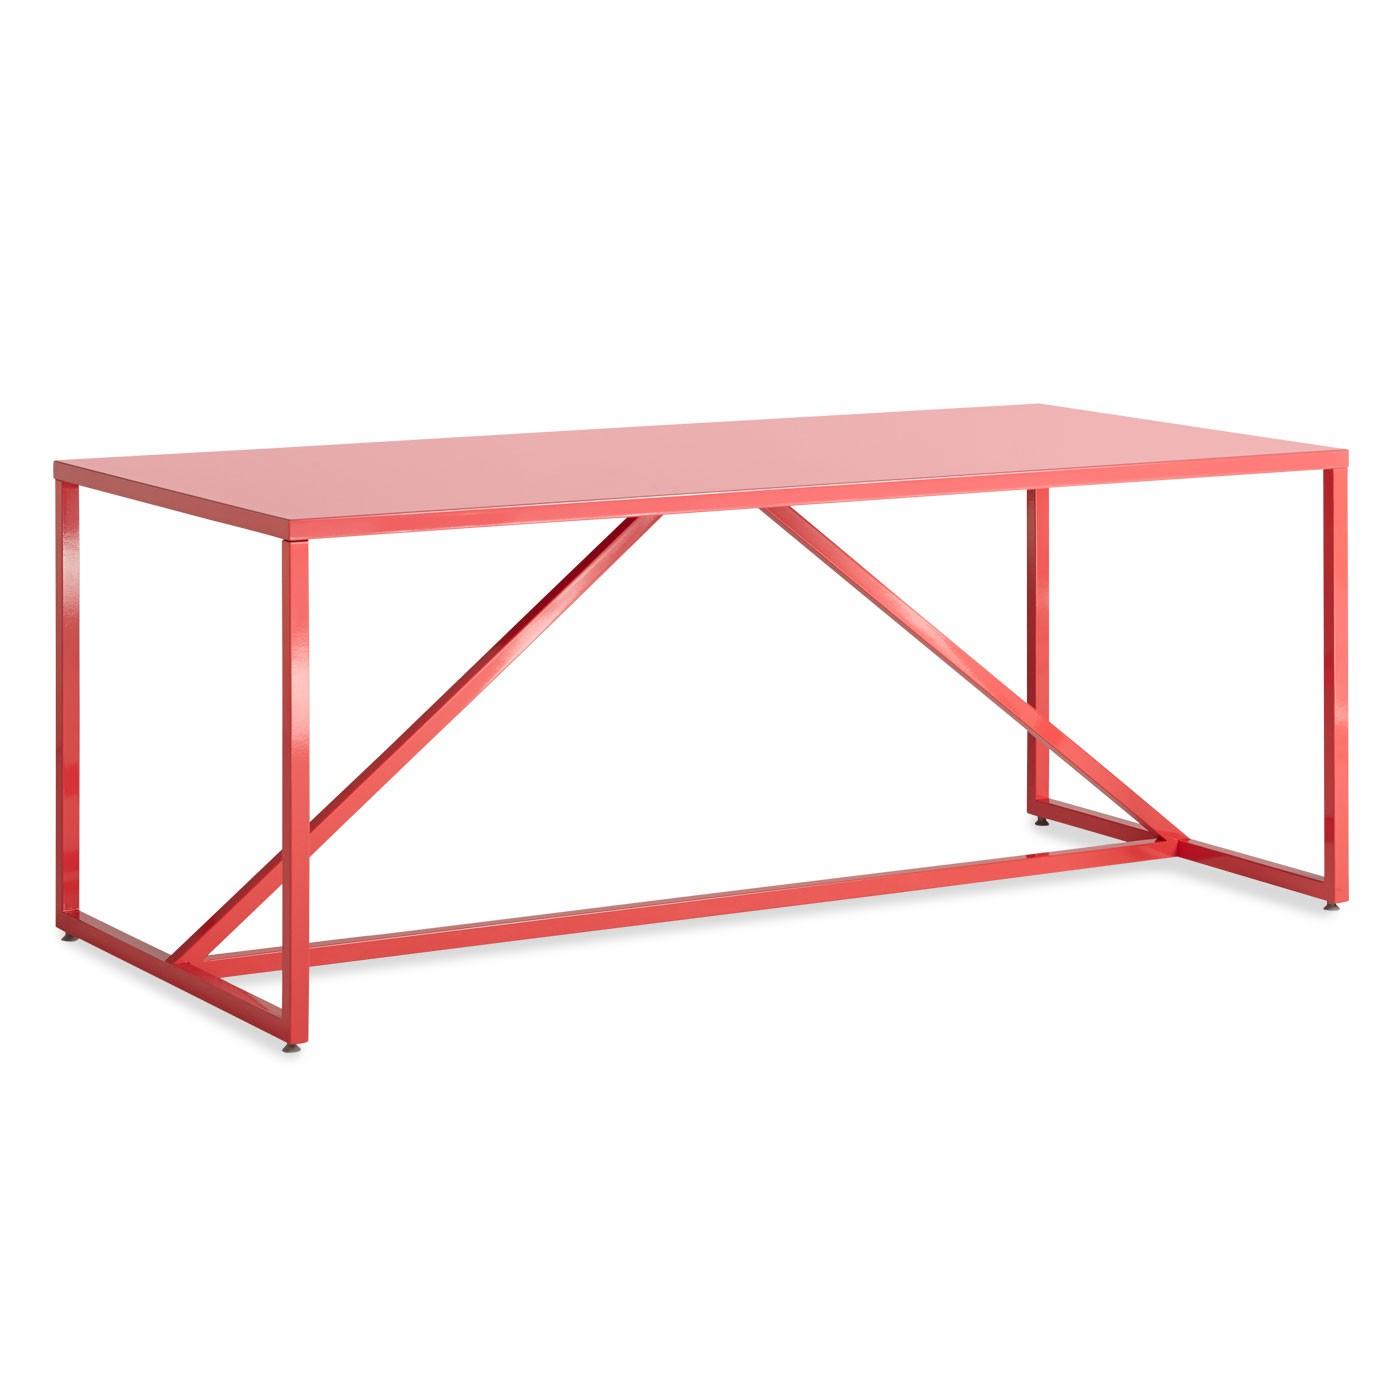 10 table.jpg